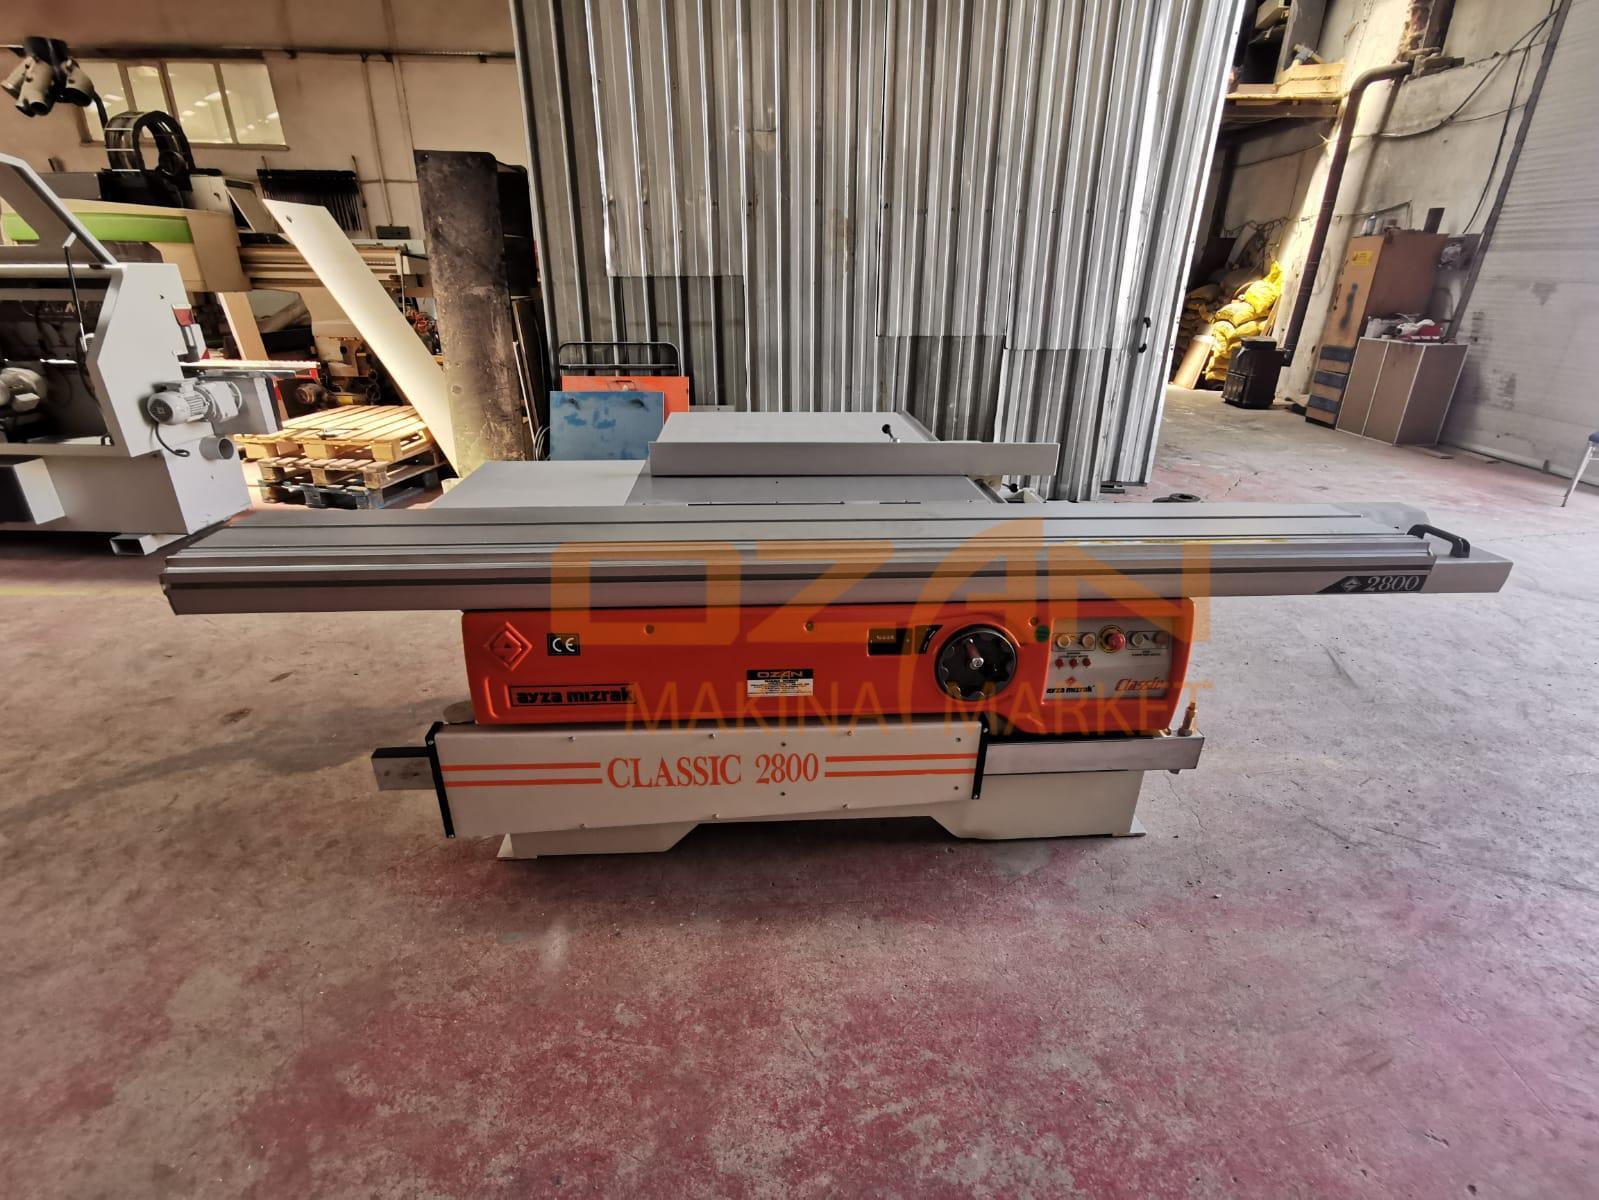 AYZA MIZRAK 2800 CLASSIC FLOATING MACHINE WITH SCRAPER